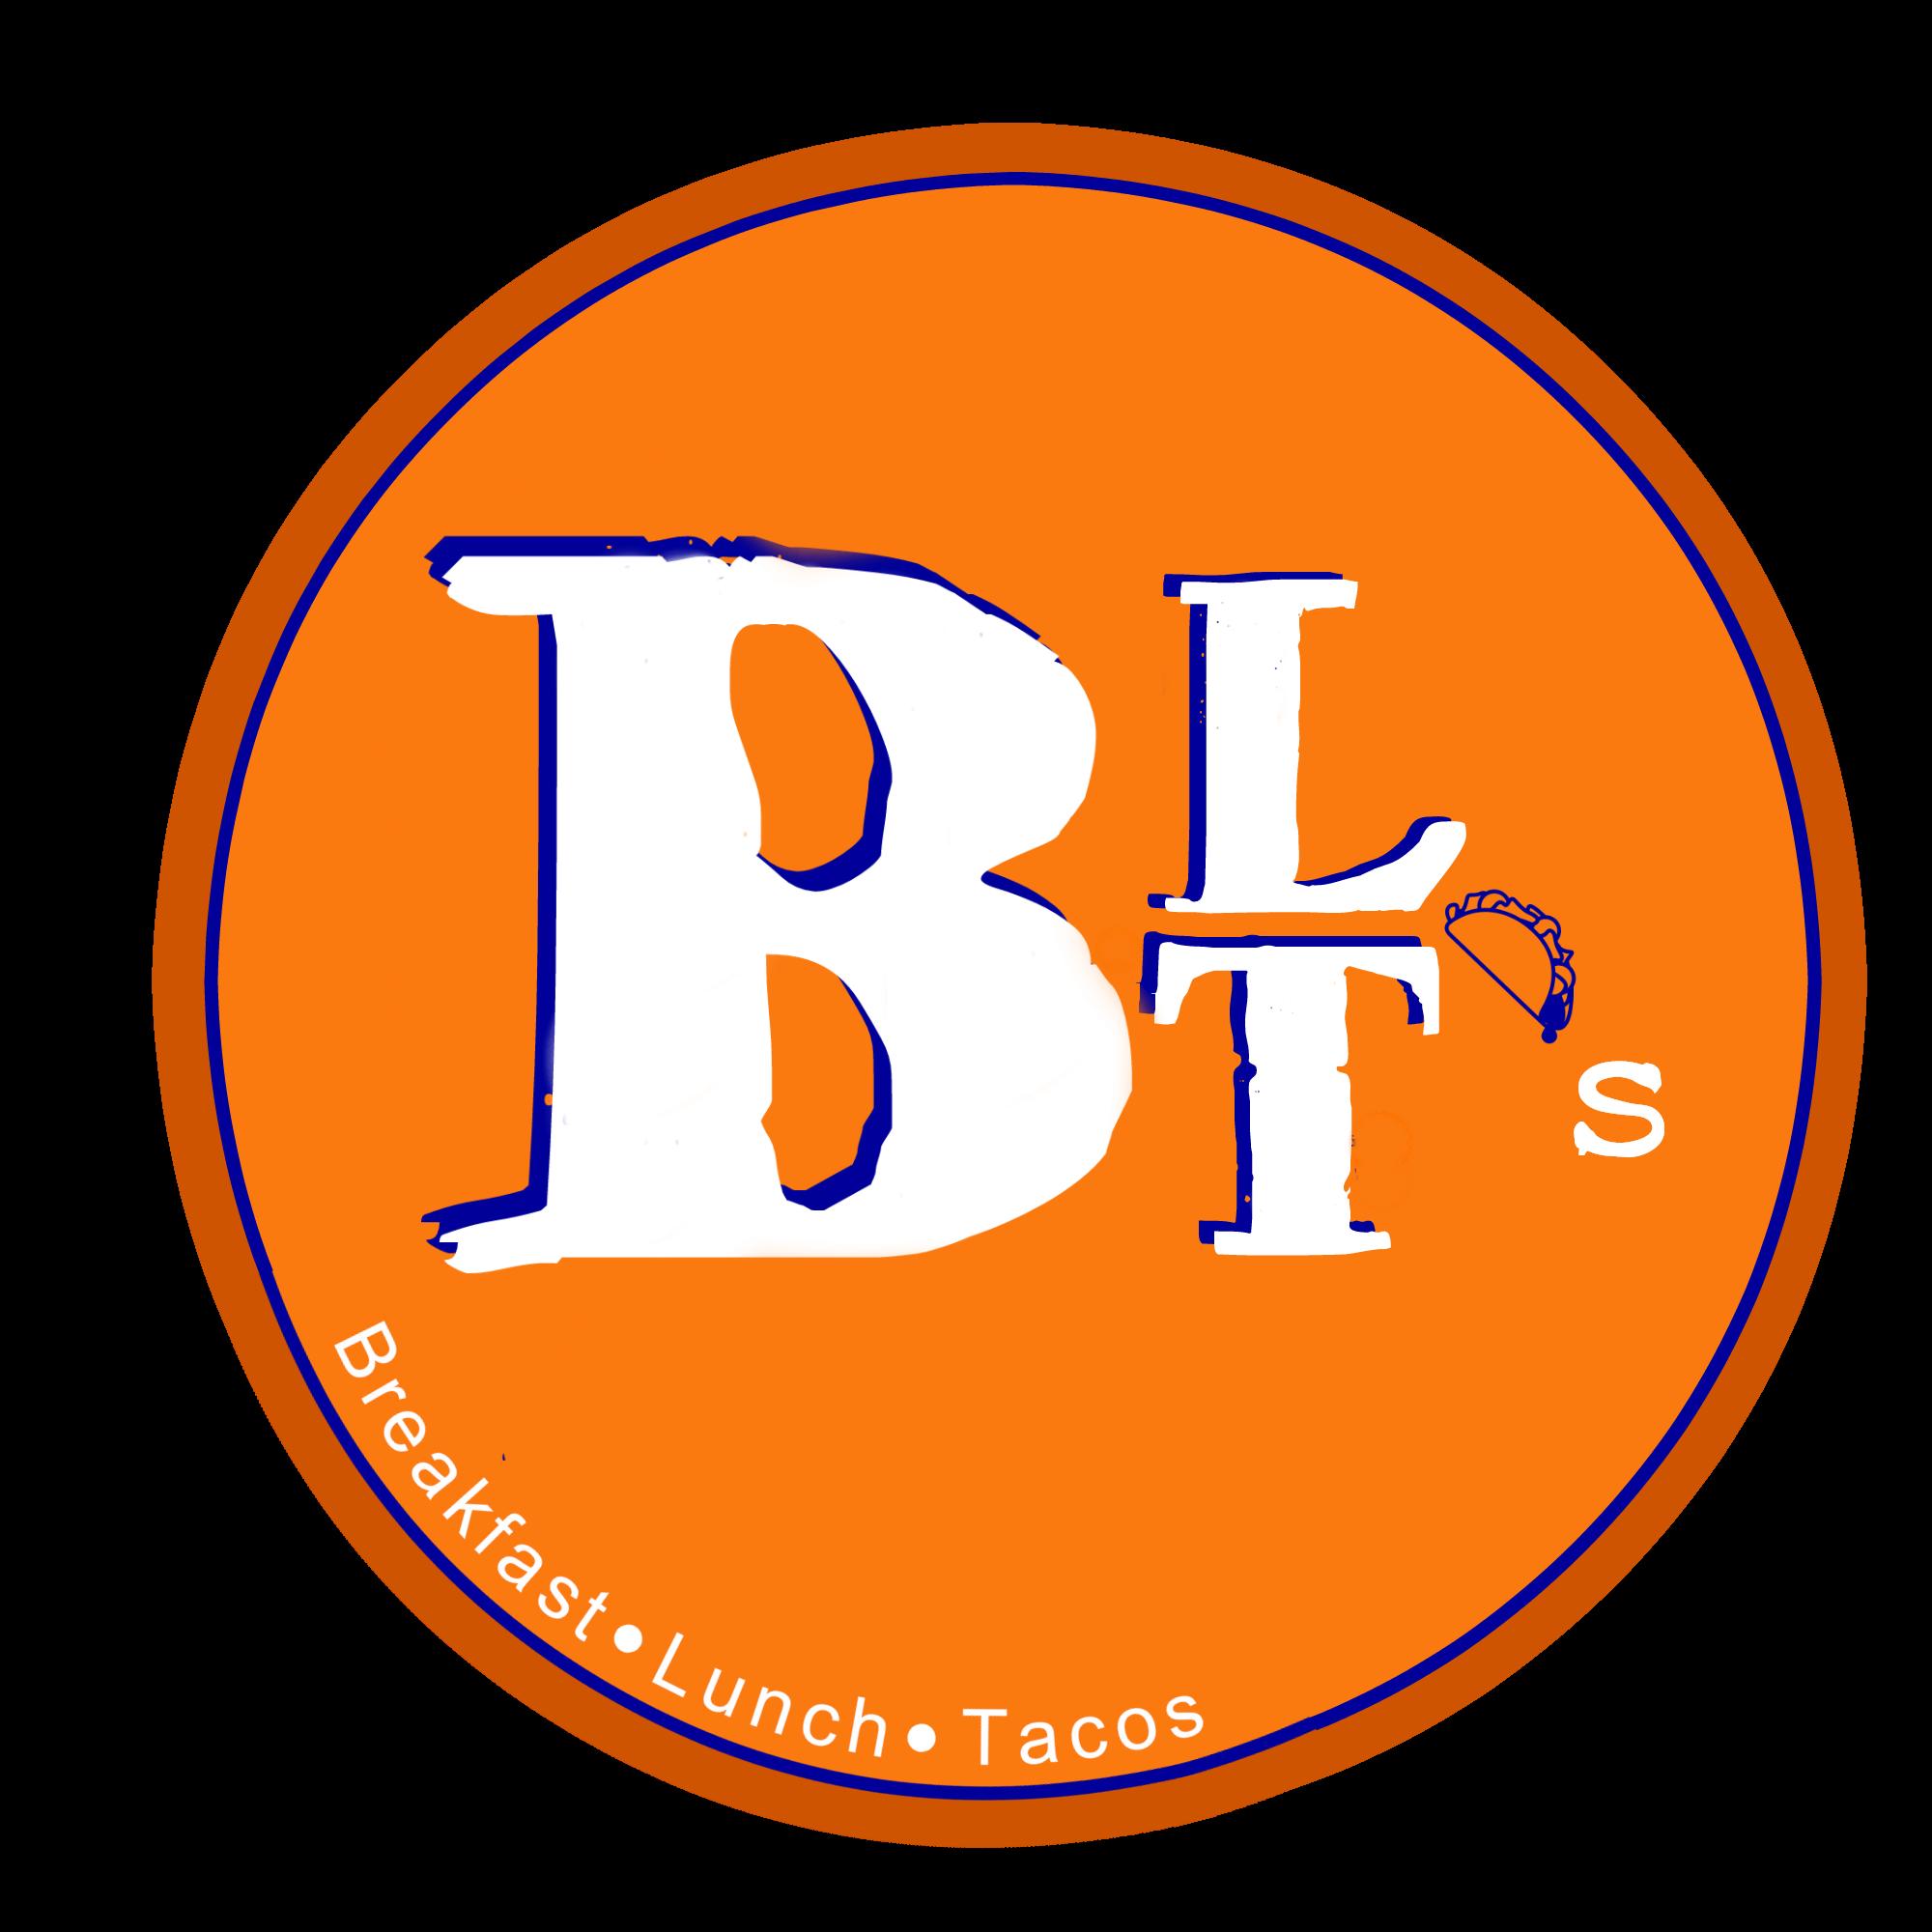 BLT's